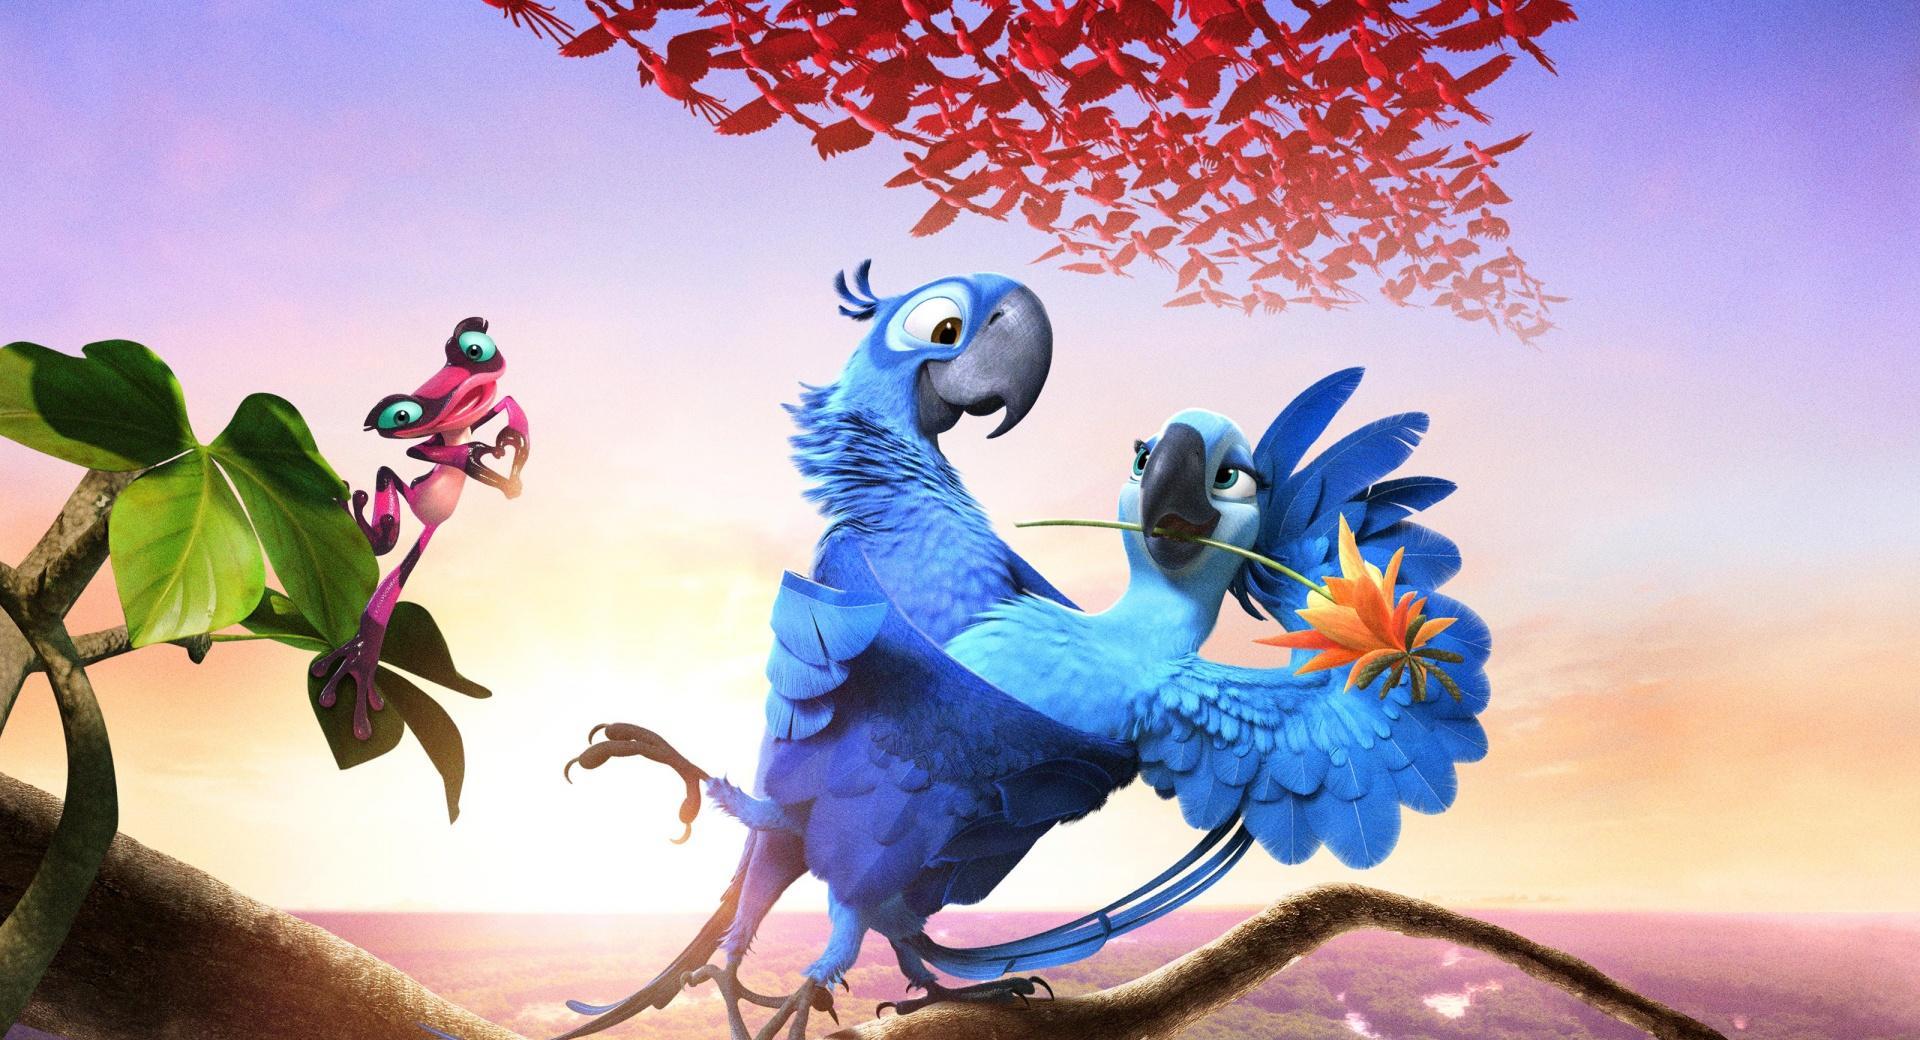 Rio 2 Movie 2014 wallpapers HD quality